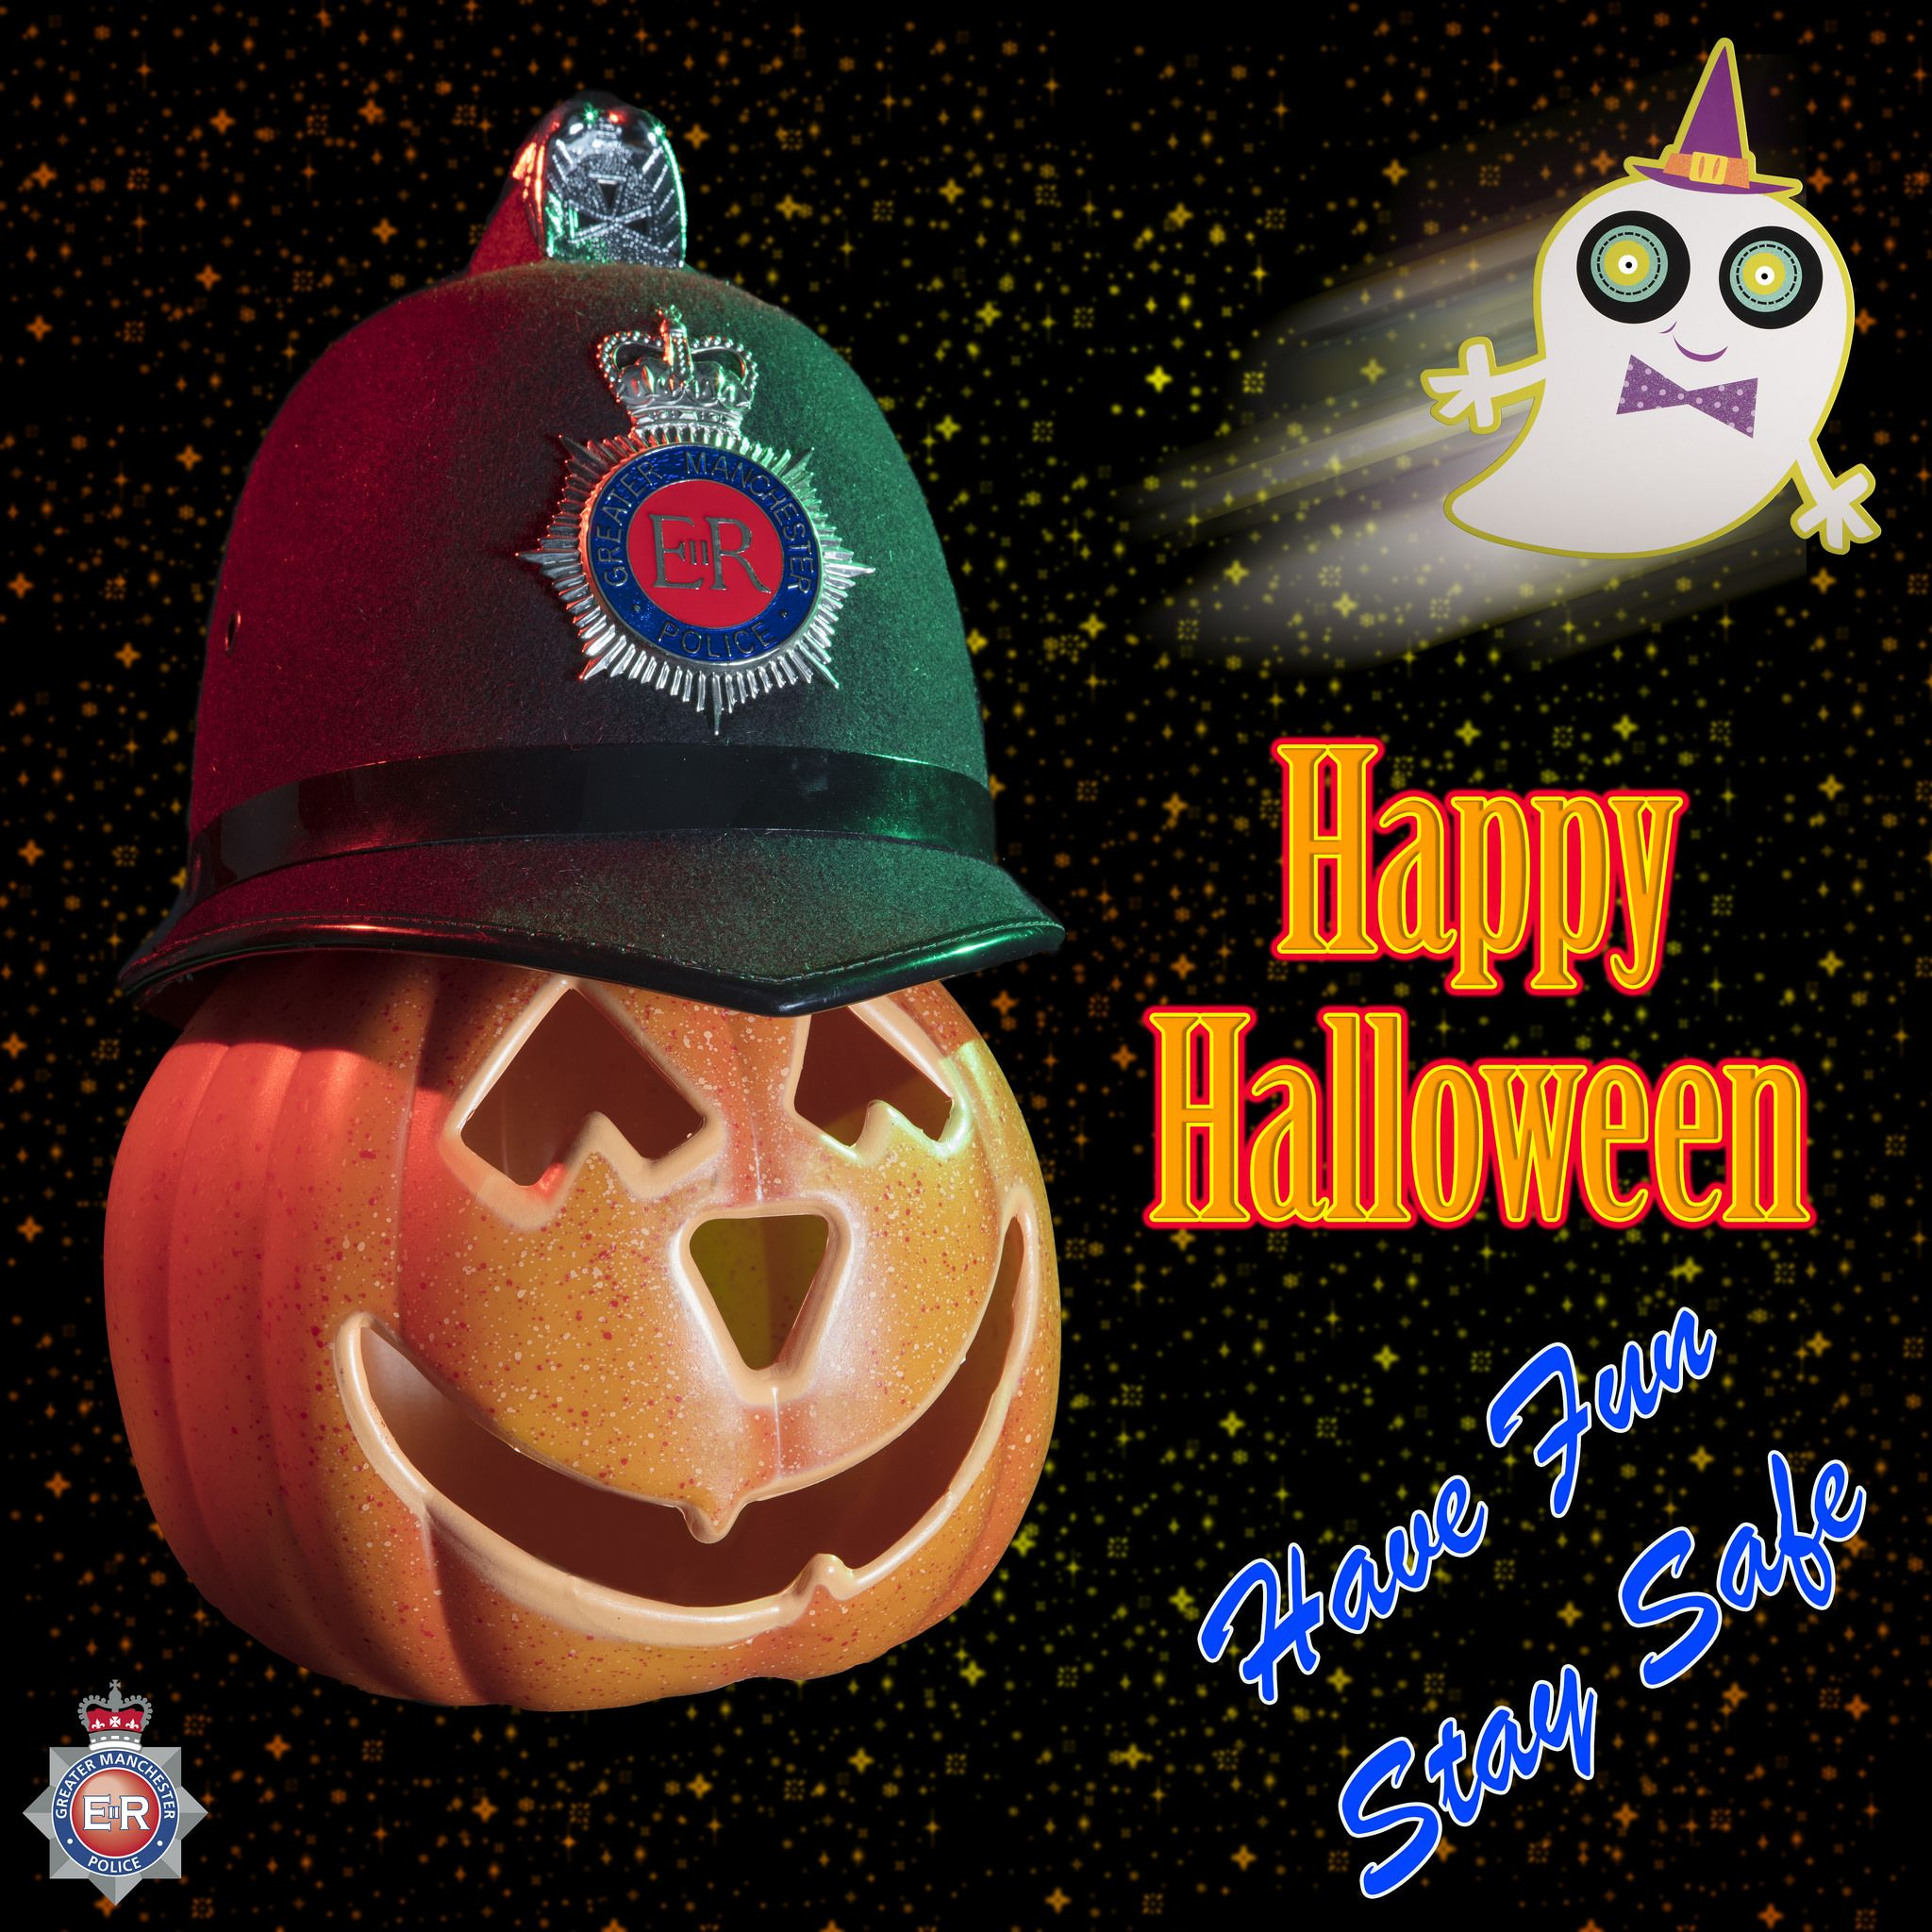 Happy Halloween Have a great night, Happy halloween, How